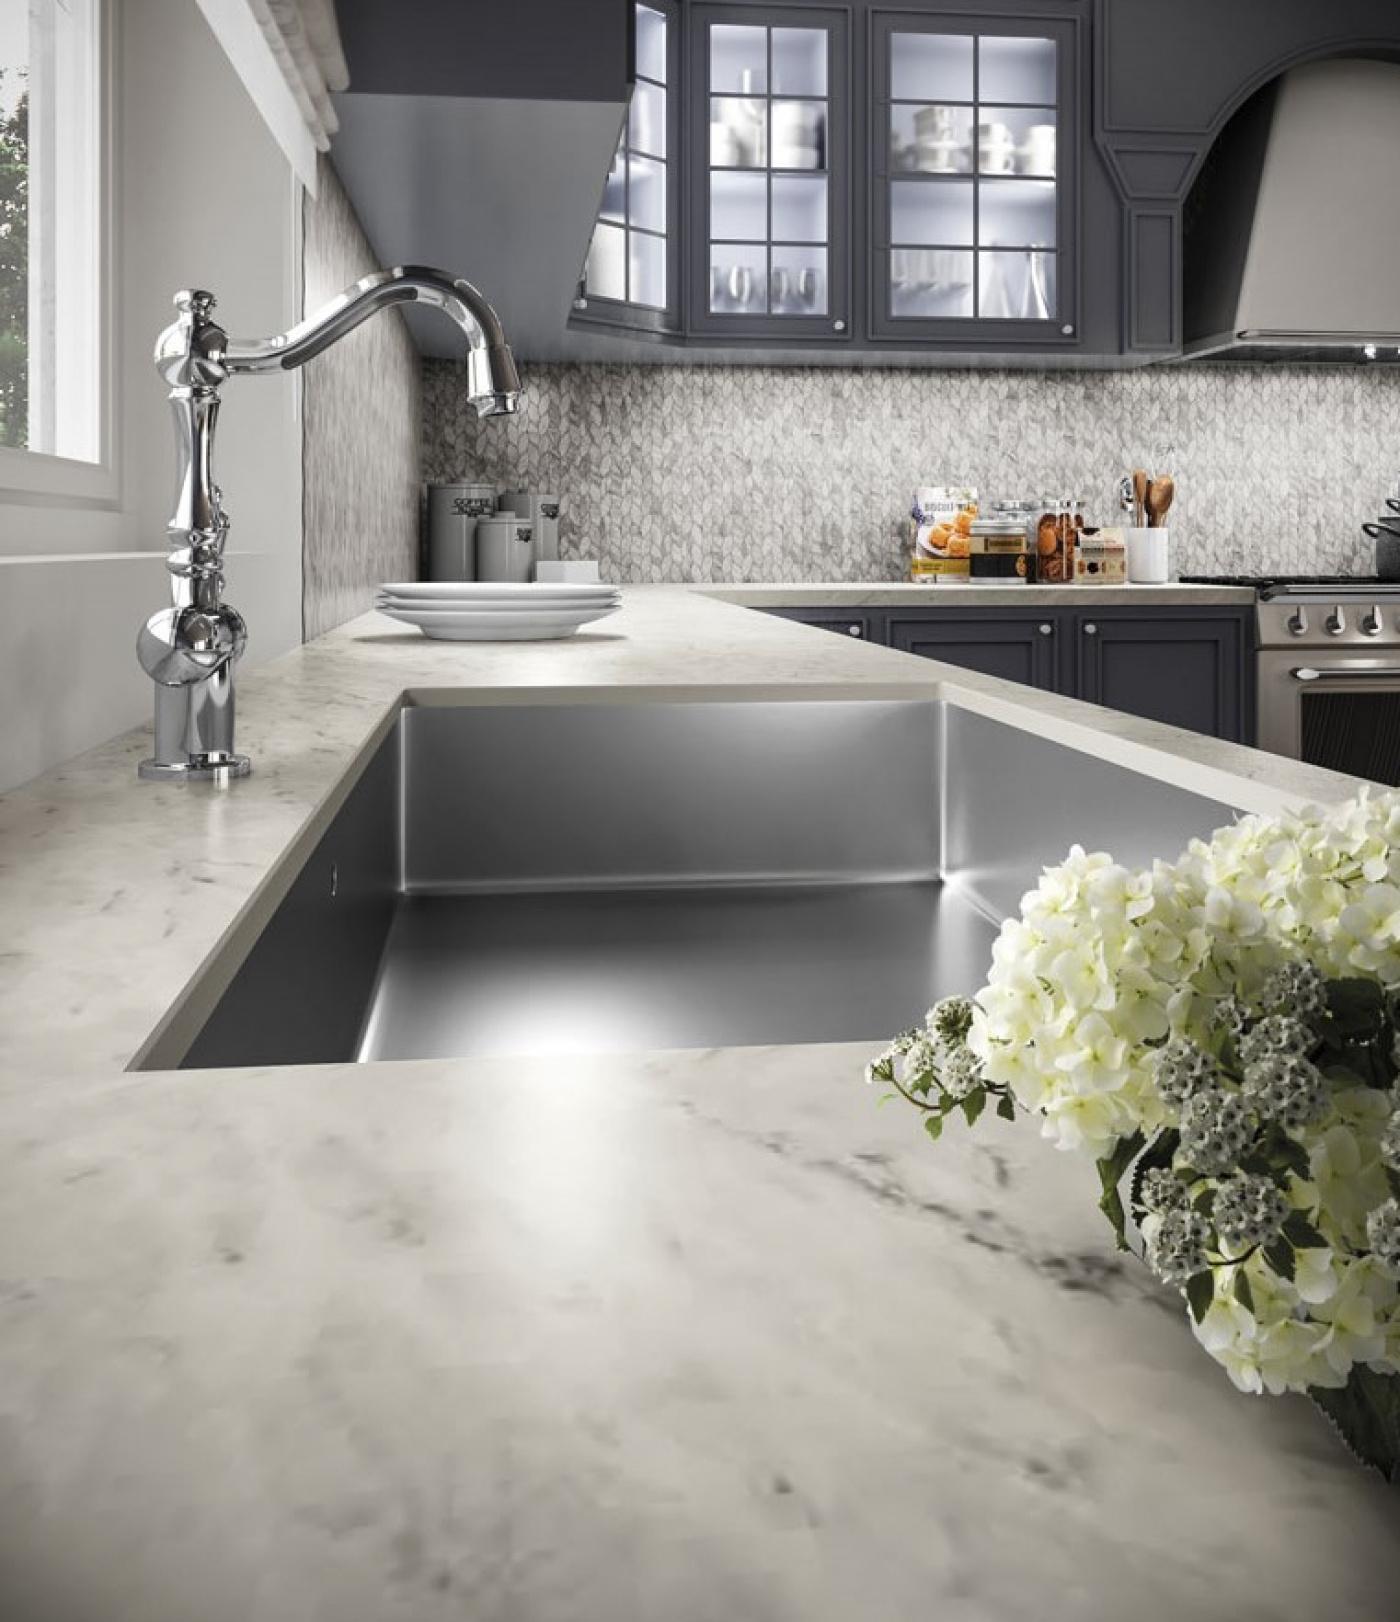 Granit Céramique marbre blanc carrare